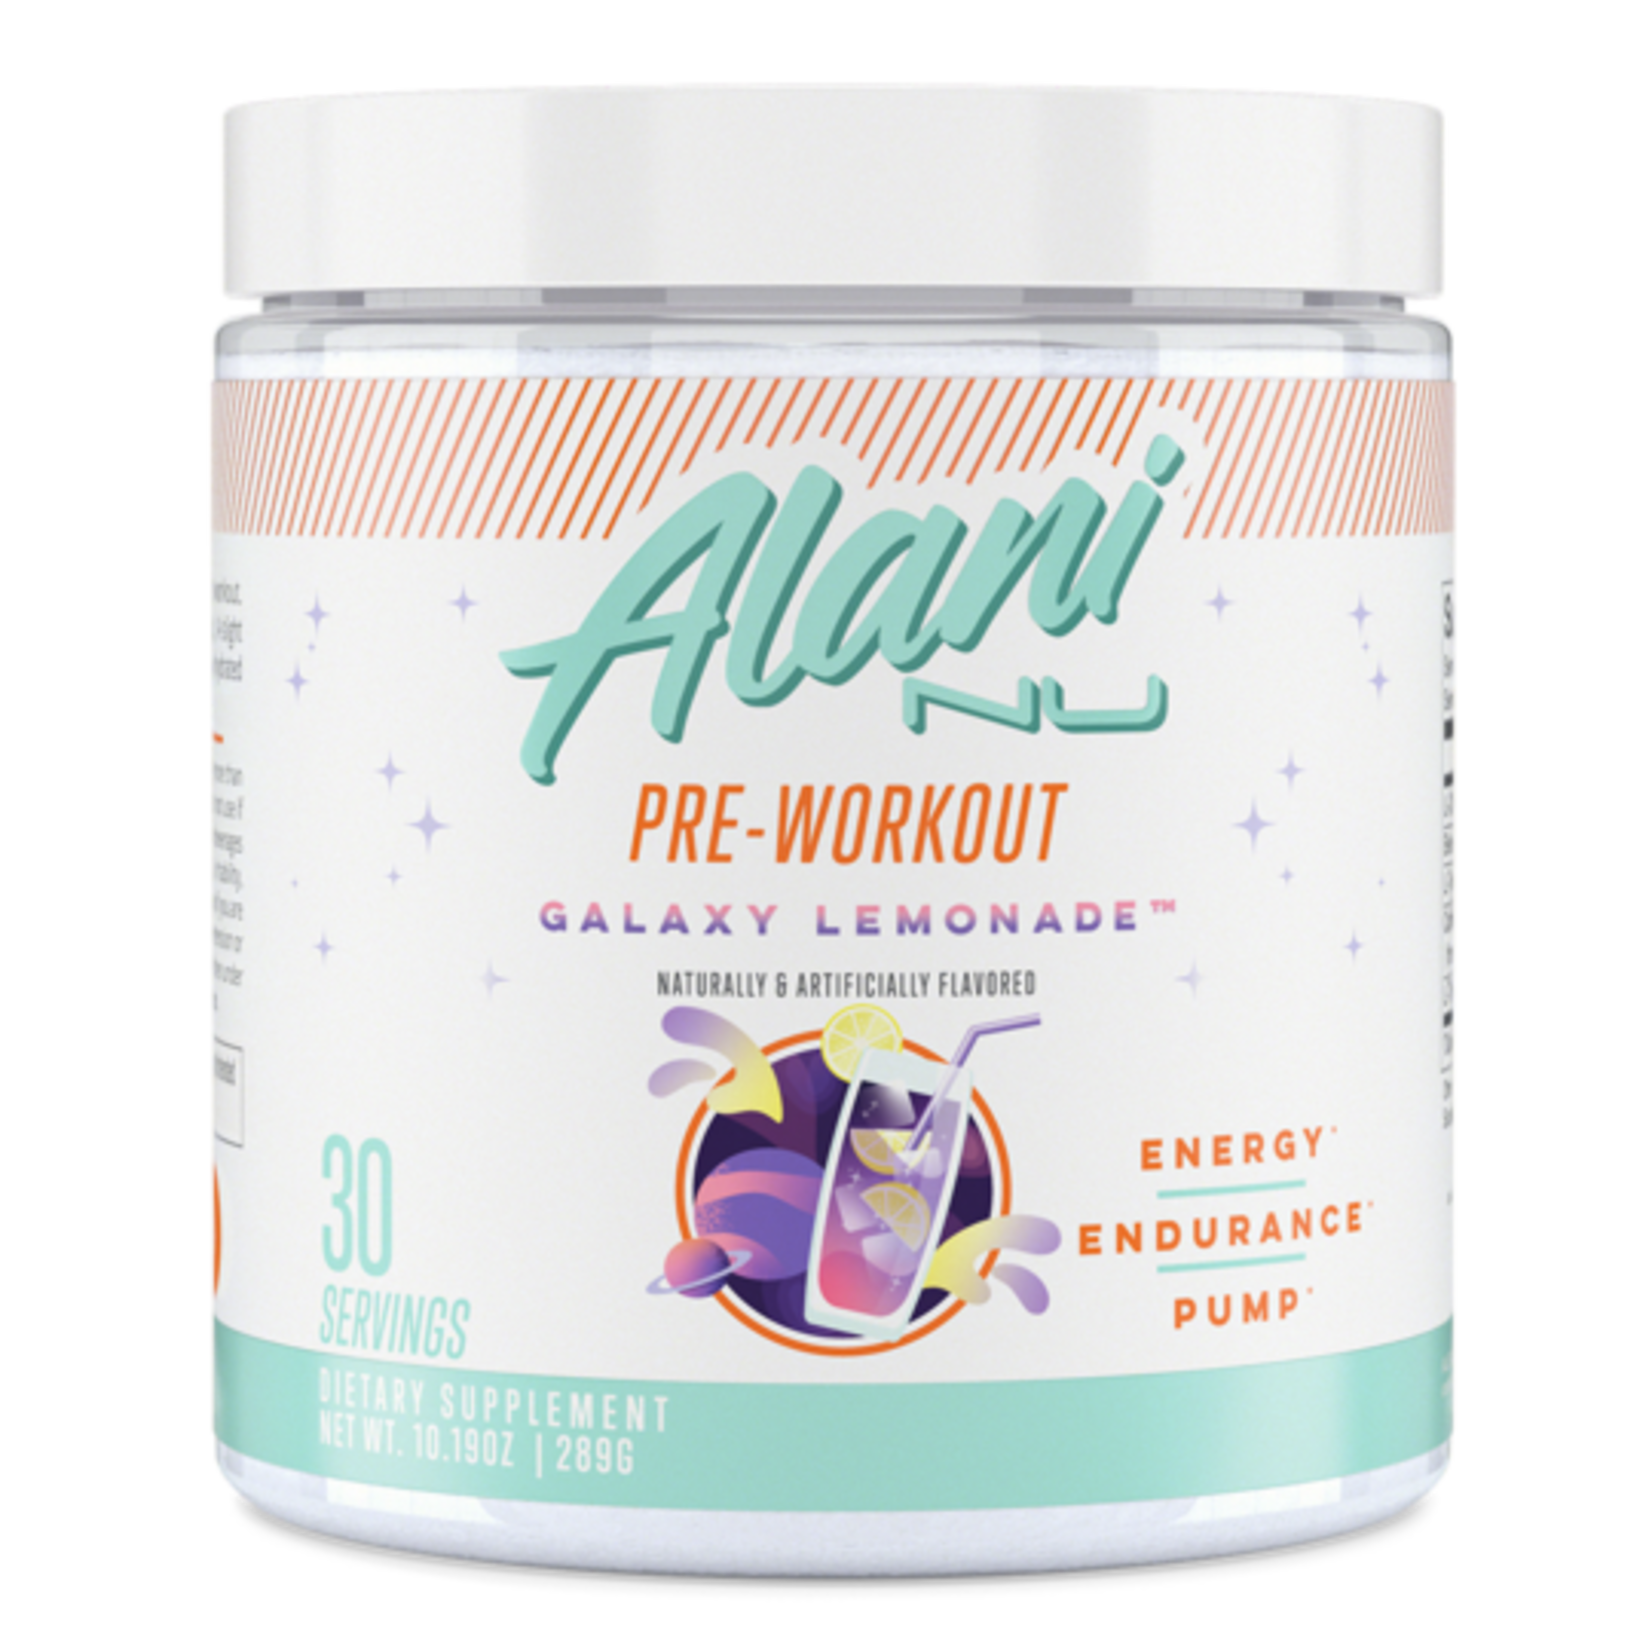 Alani Nu Pre Workout Galaxy Lemonade 289g